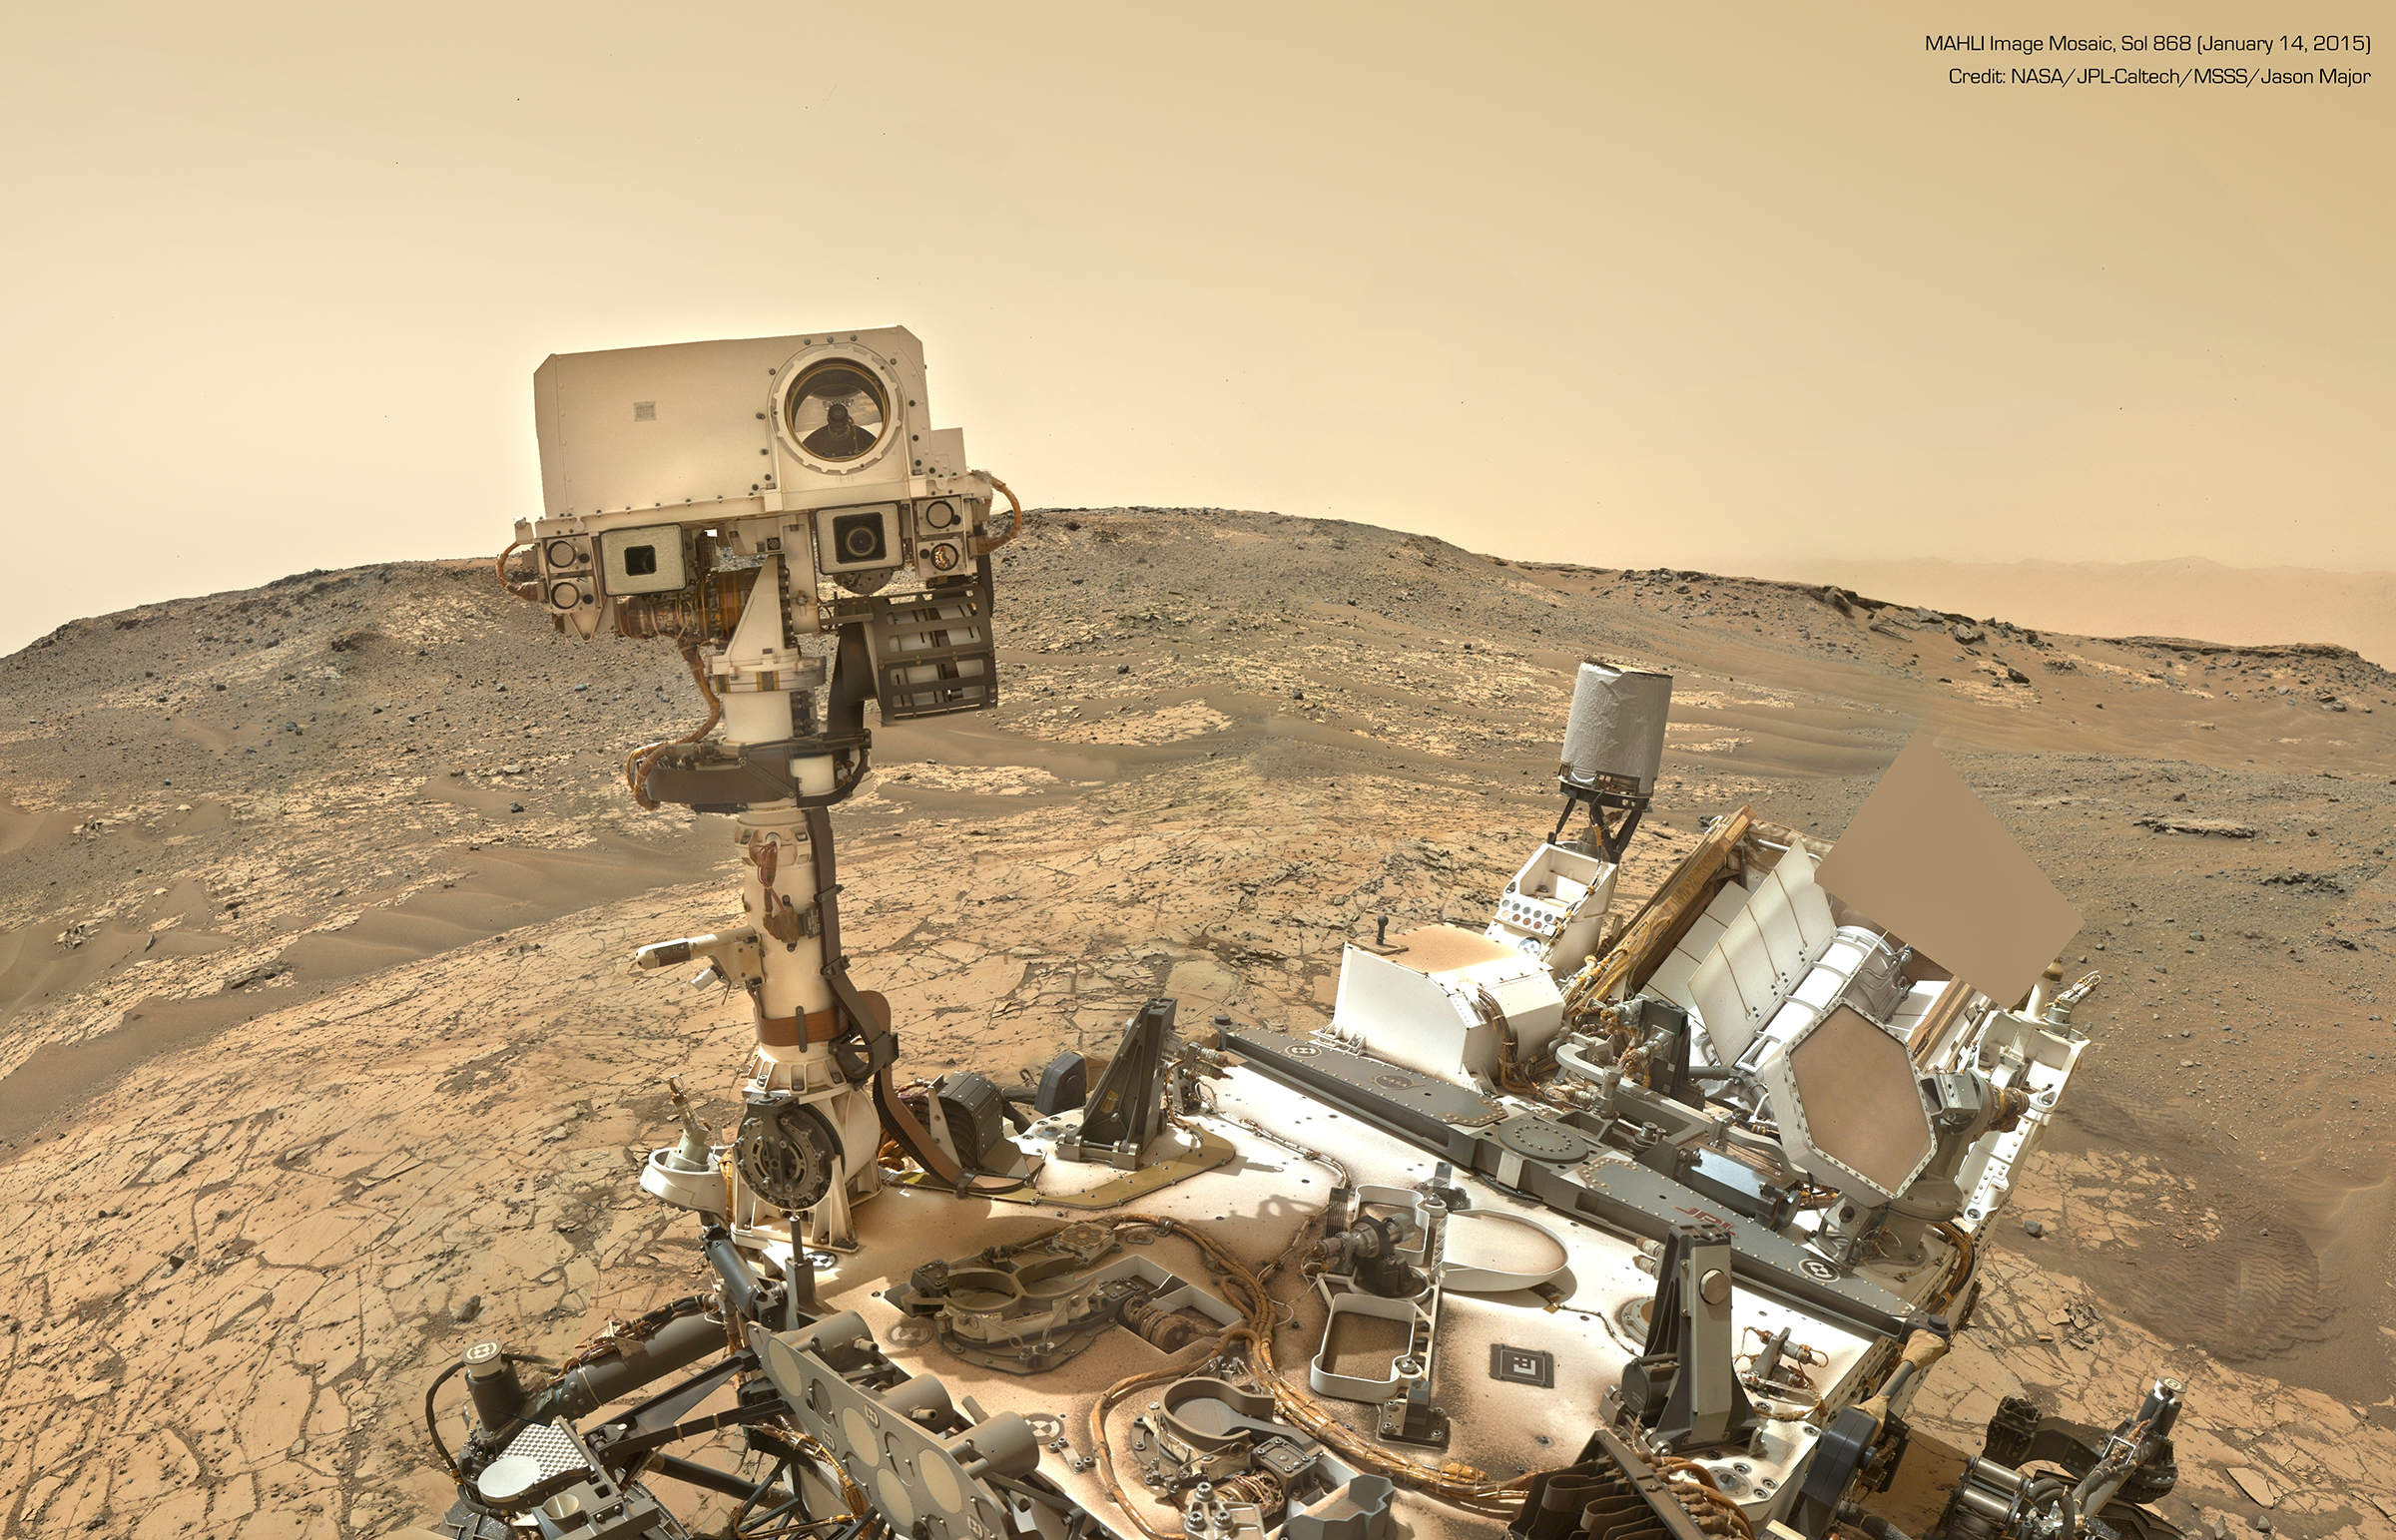 CURIOSITY--FIRST -SELFIE- IN 2015 ON MARS